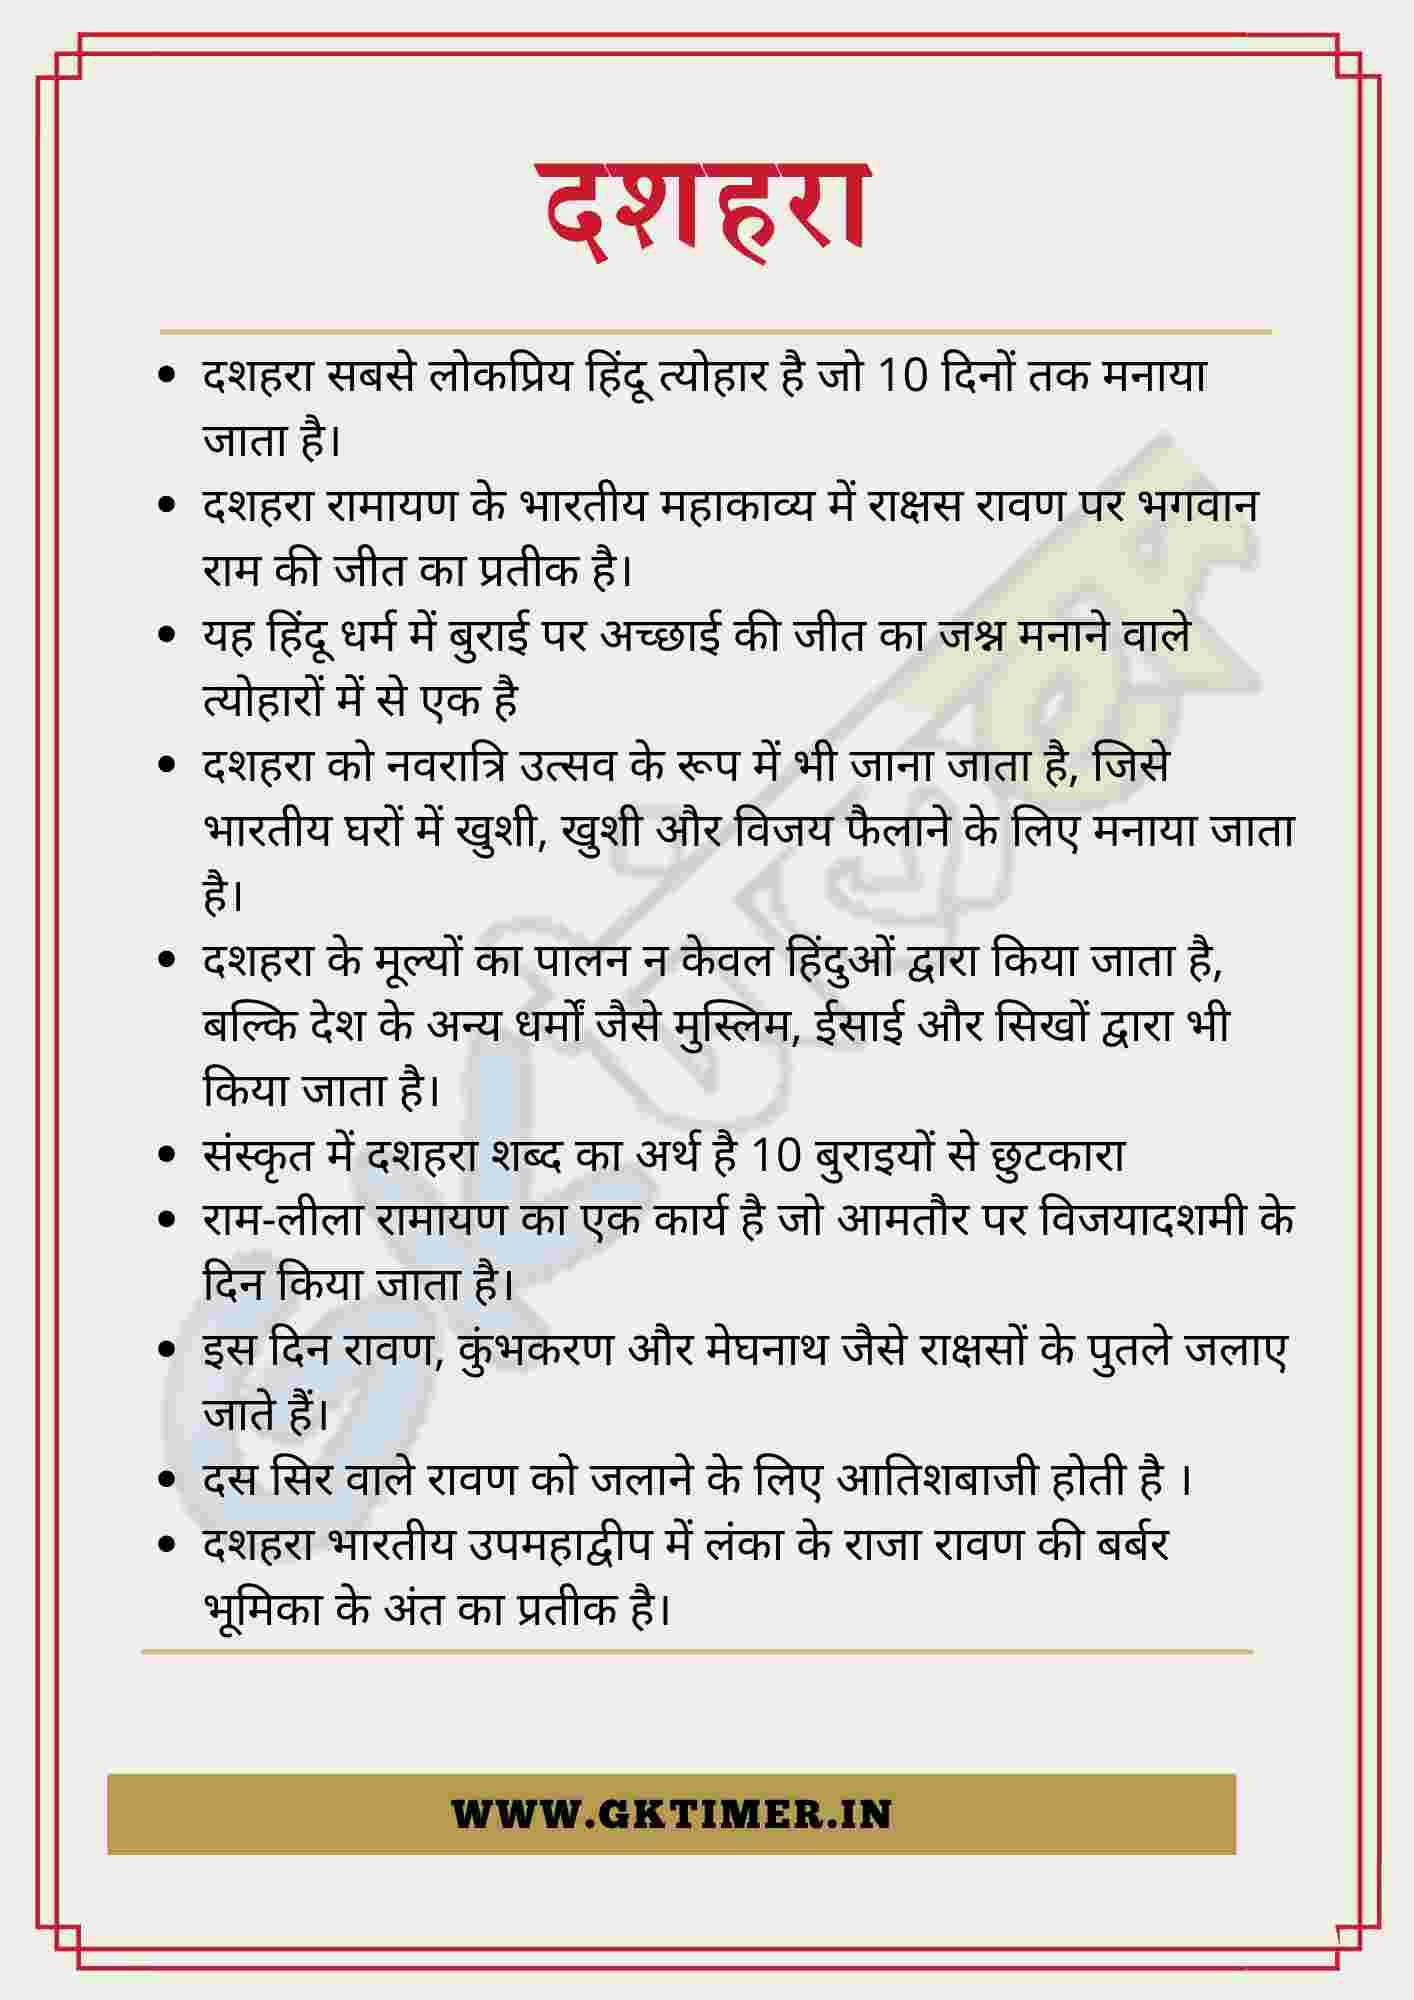 दशहरा पर निबंध | Dussehra Essay in Hindi | 10 Lines on Dussehra in Hindi